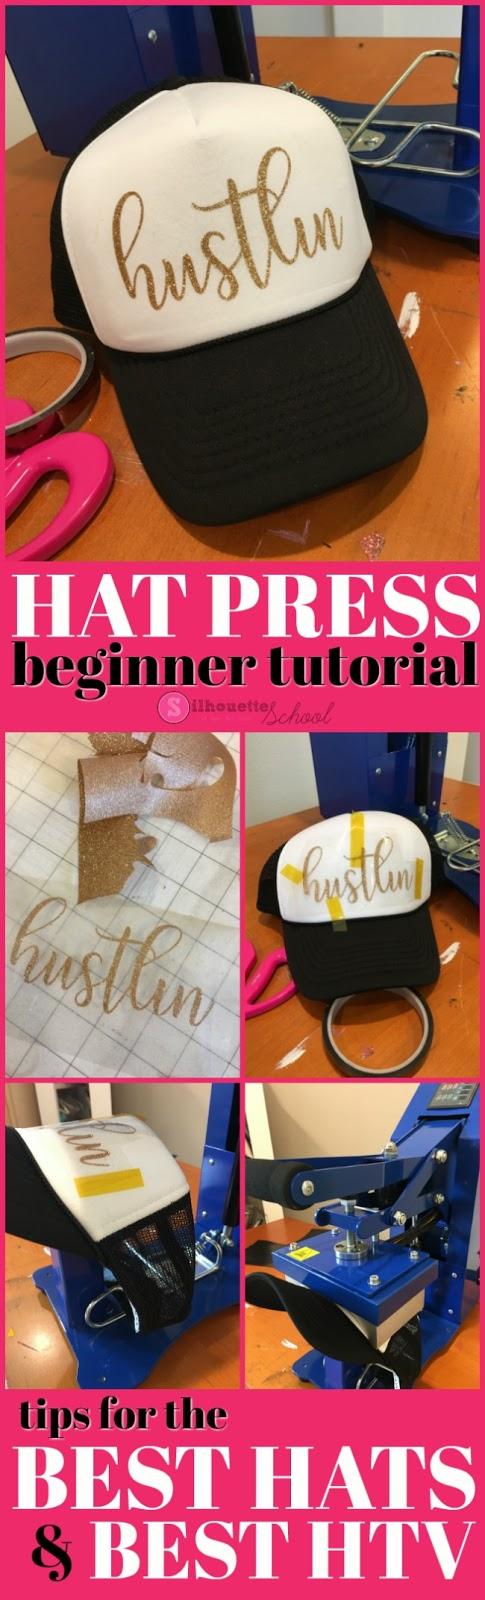 hat press, hat heat press, cap heat press, hat heat press machine, hat press machine, silhouette cameo